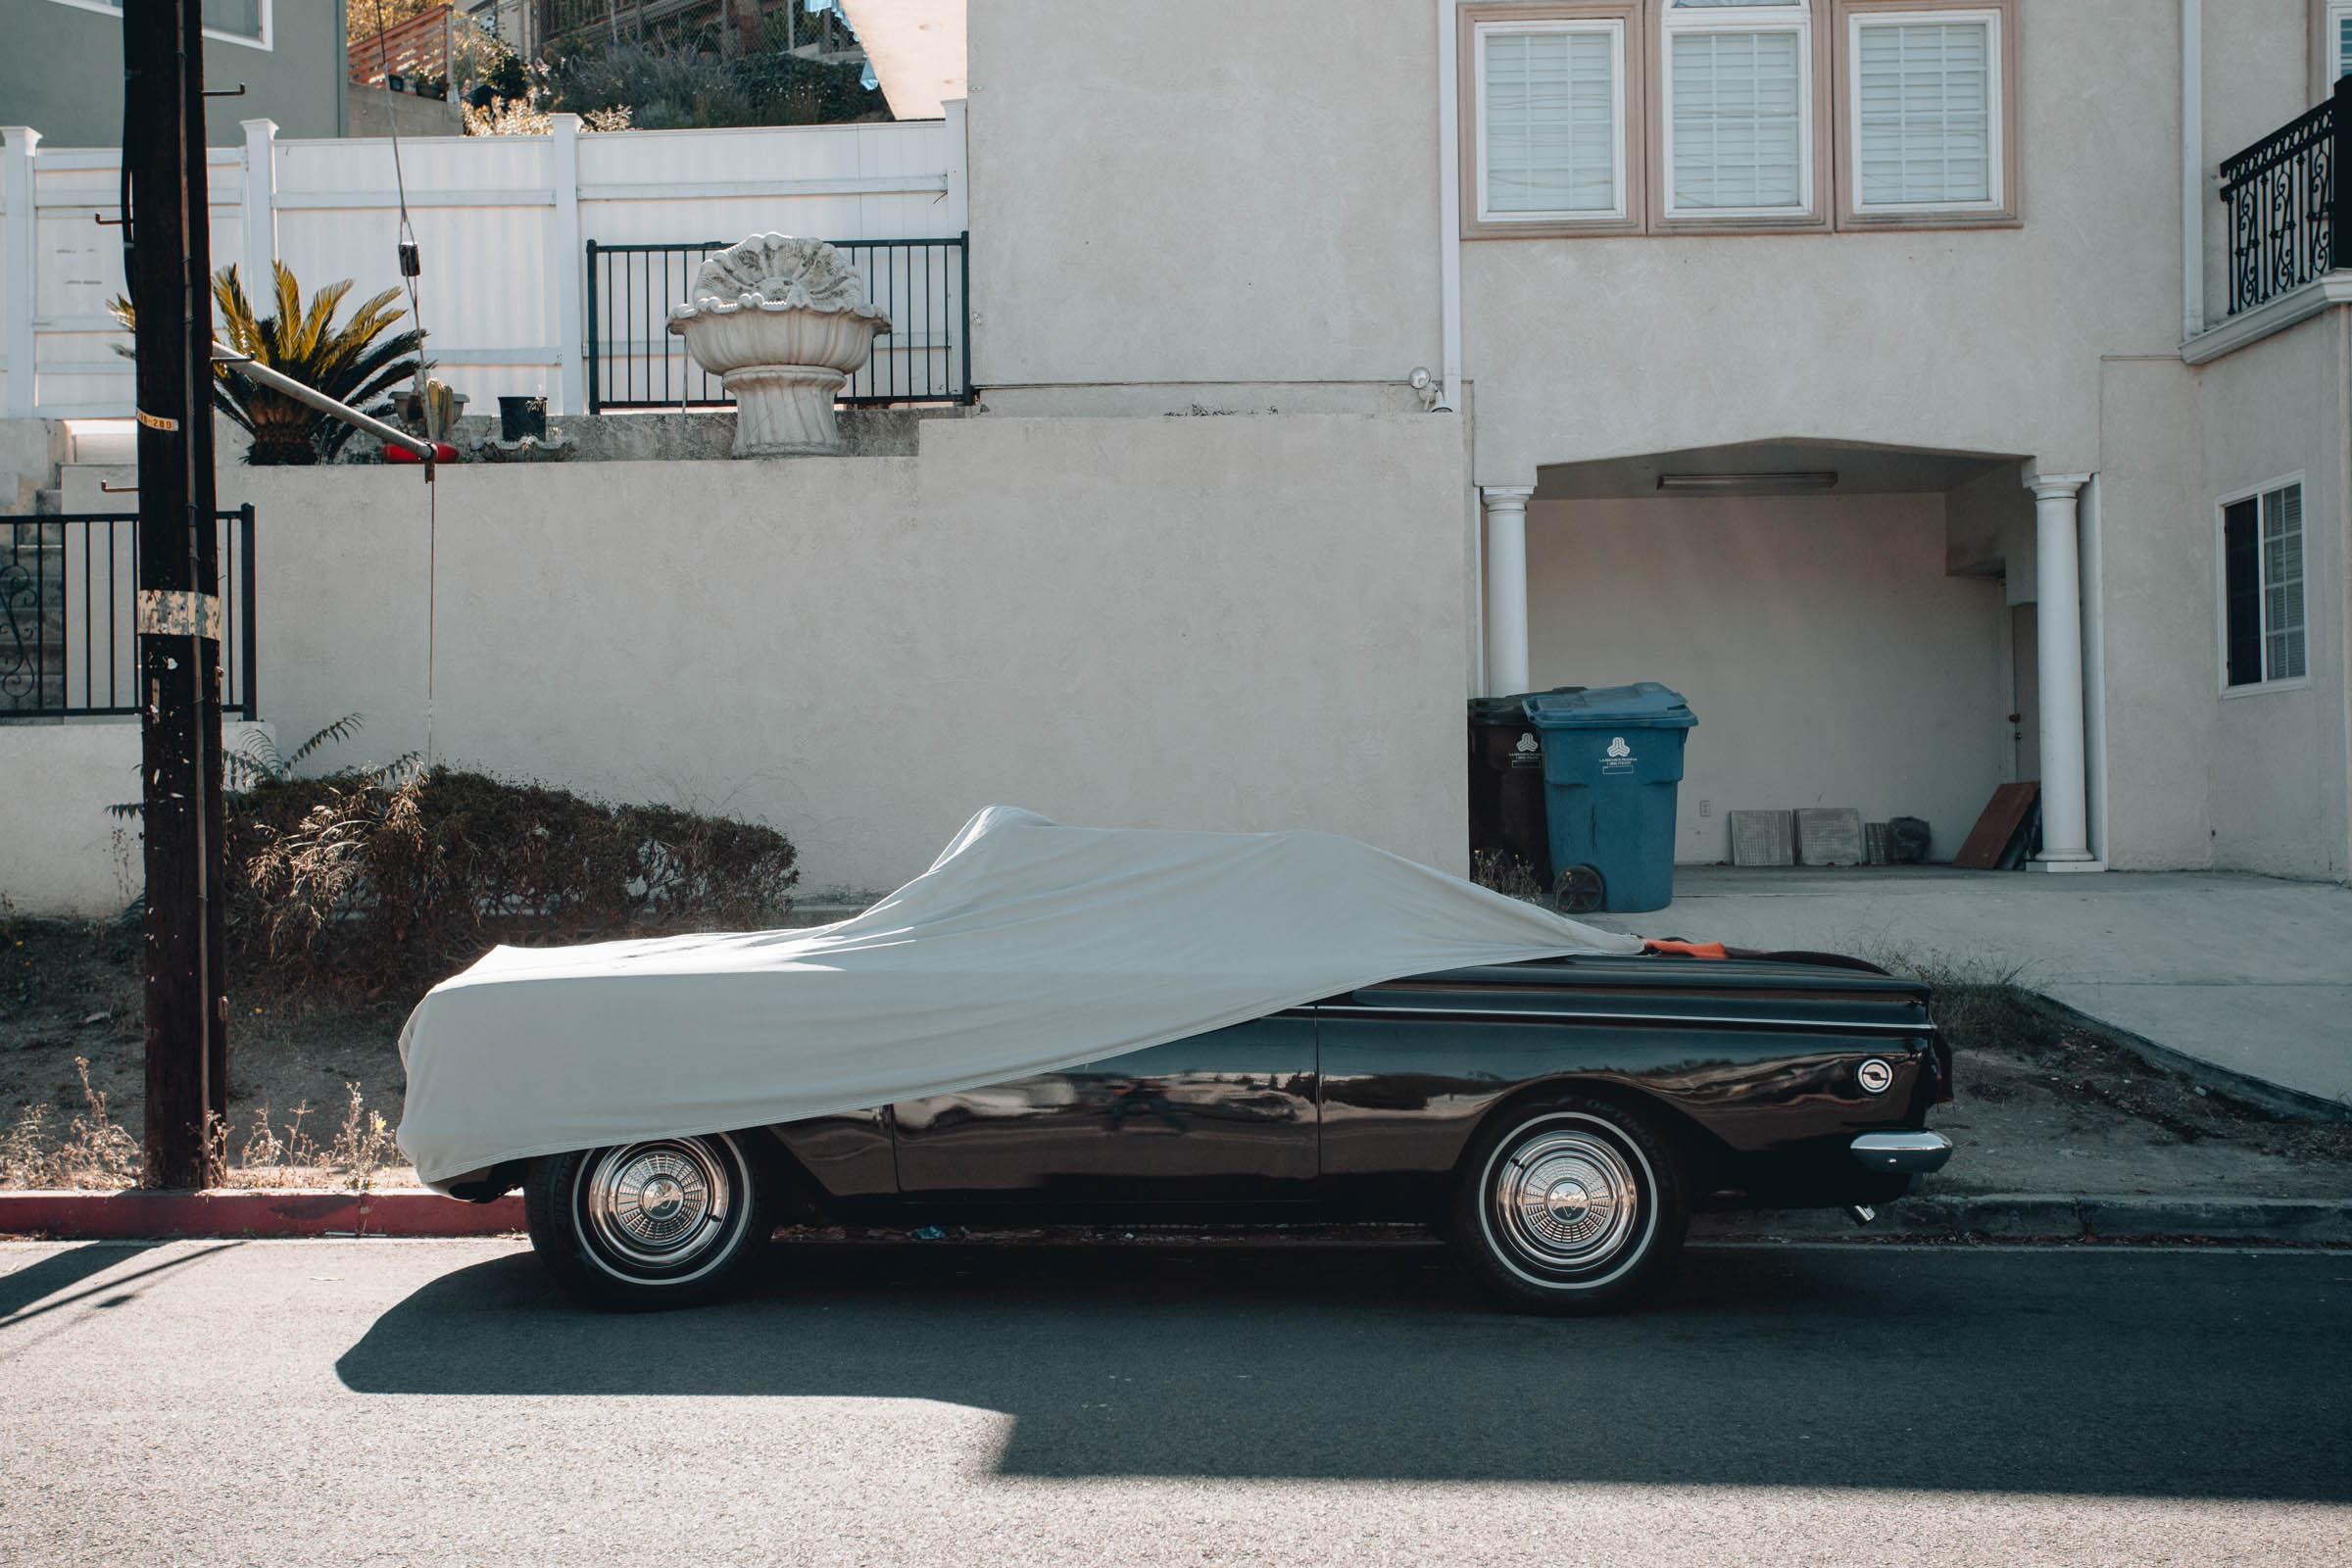 Chacon Images_LA_VintageCArs_Web-13.jpg